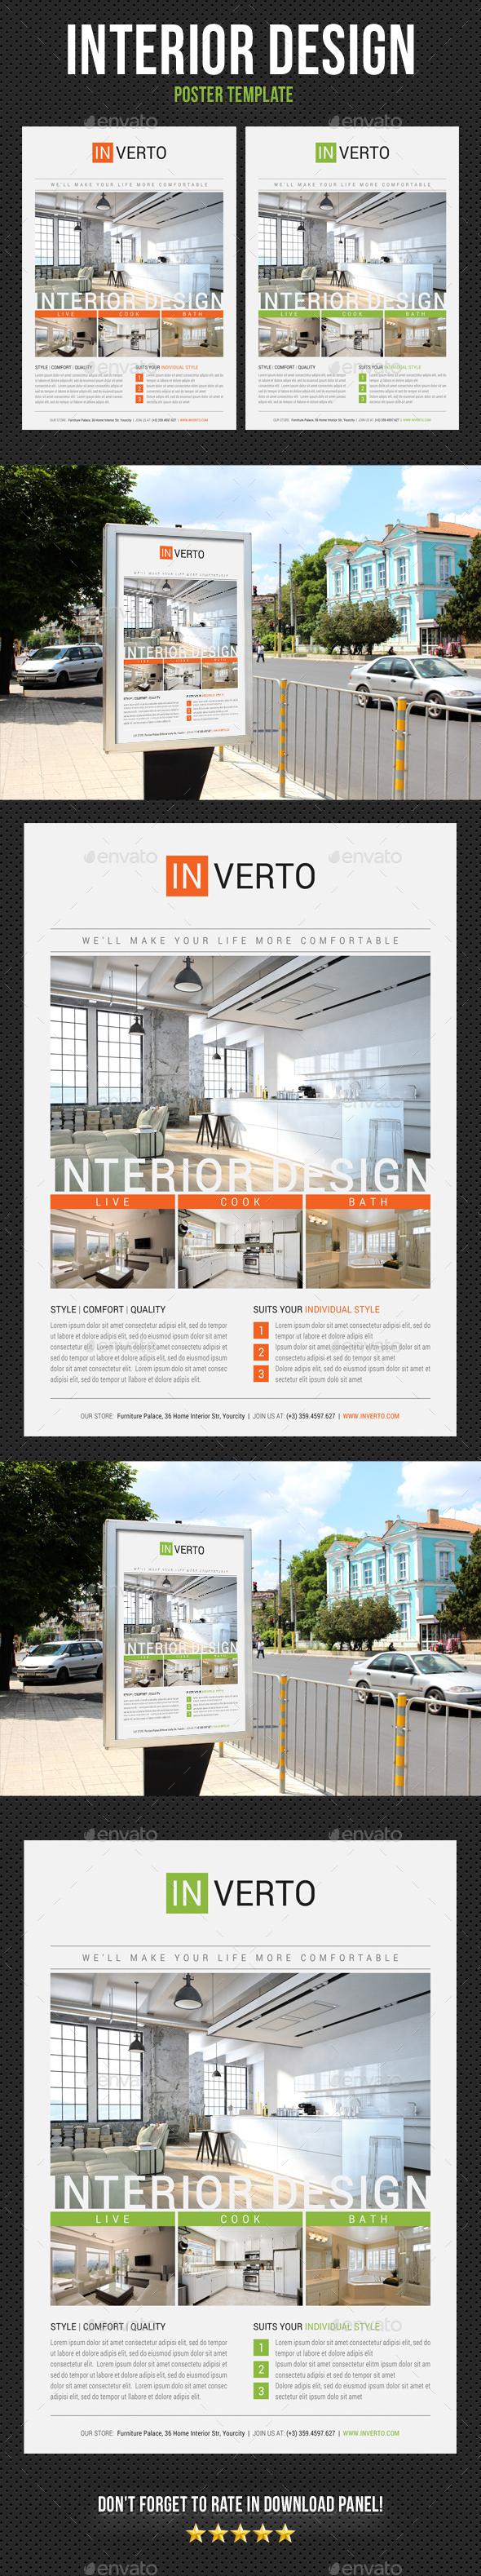 Interior Design Poster Template V12 - Signage Print Templates